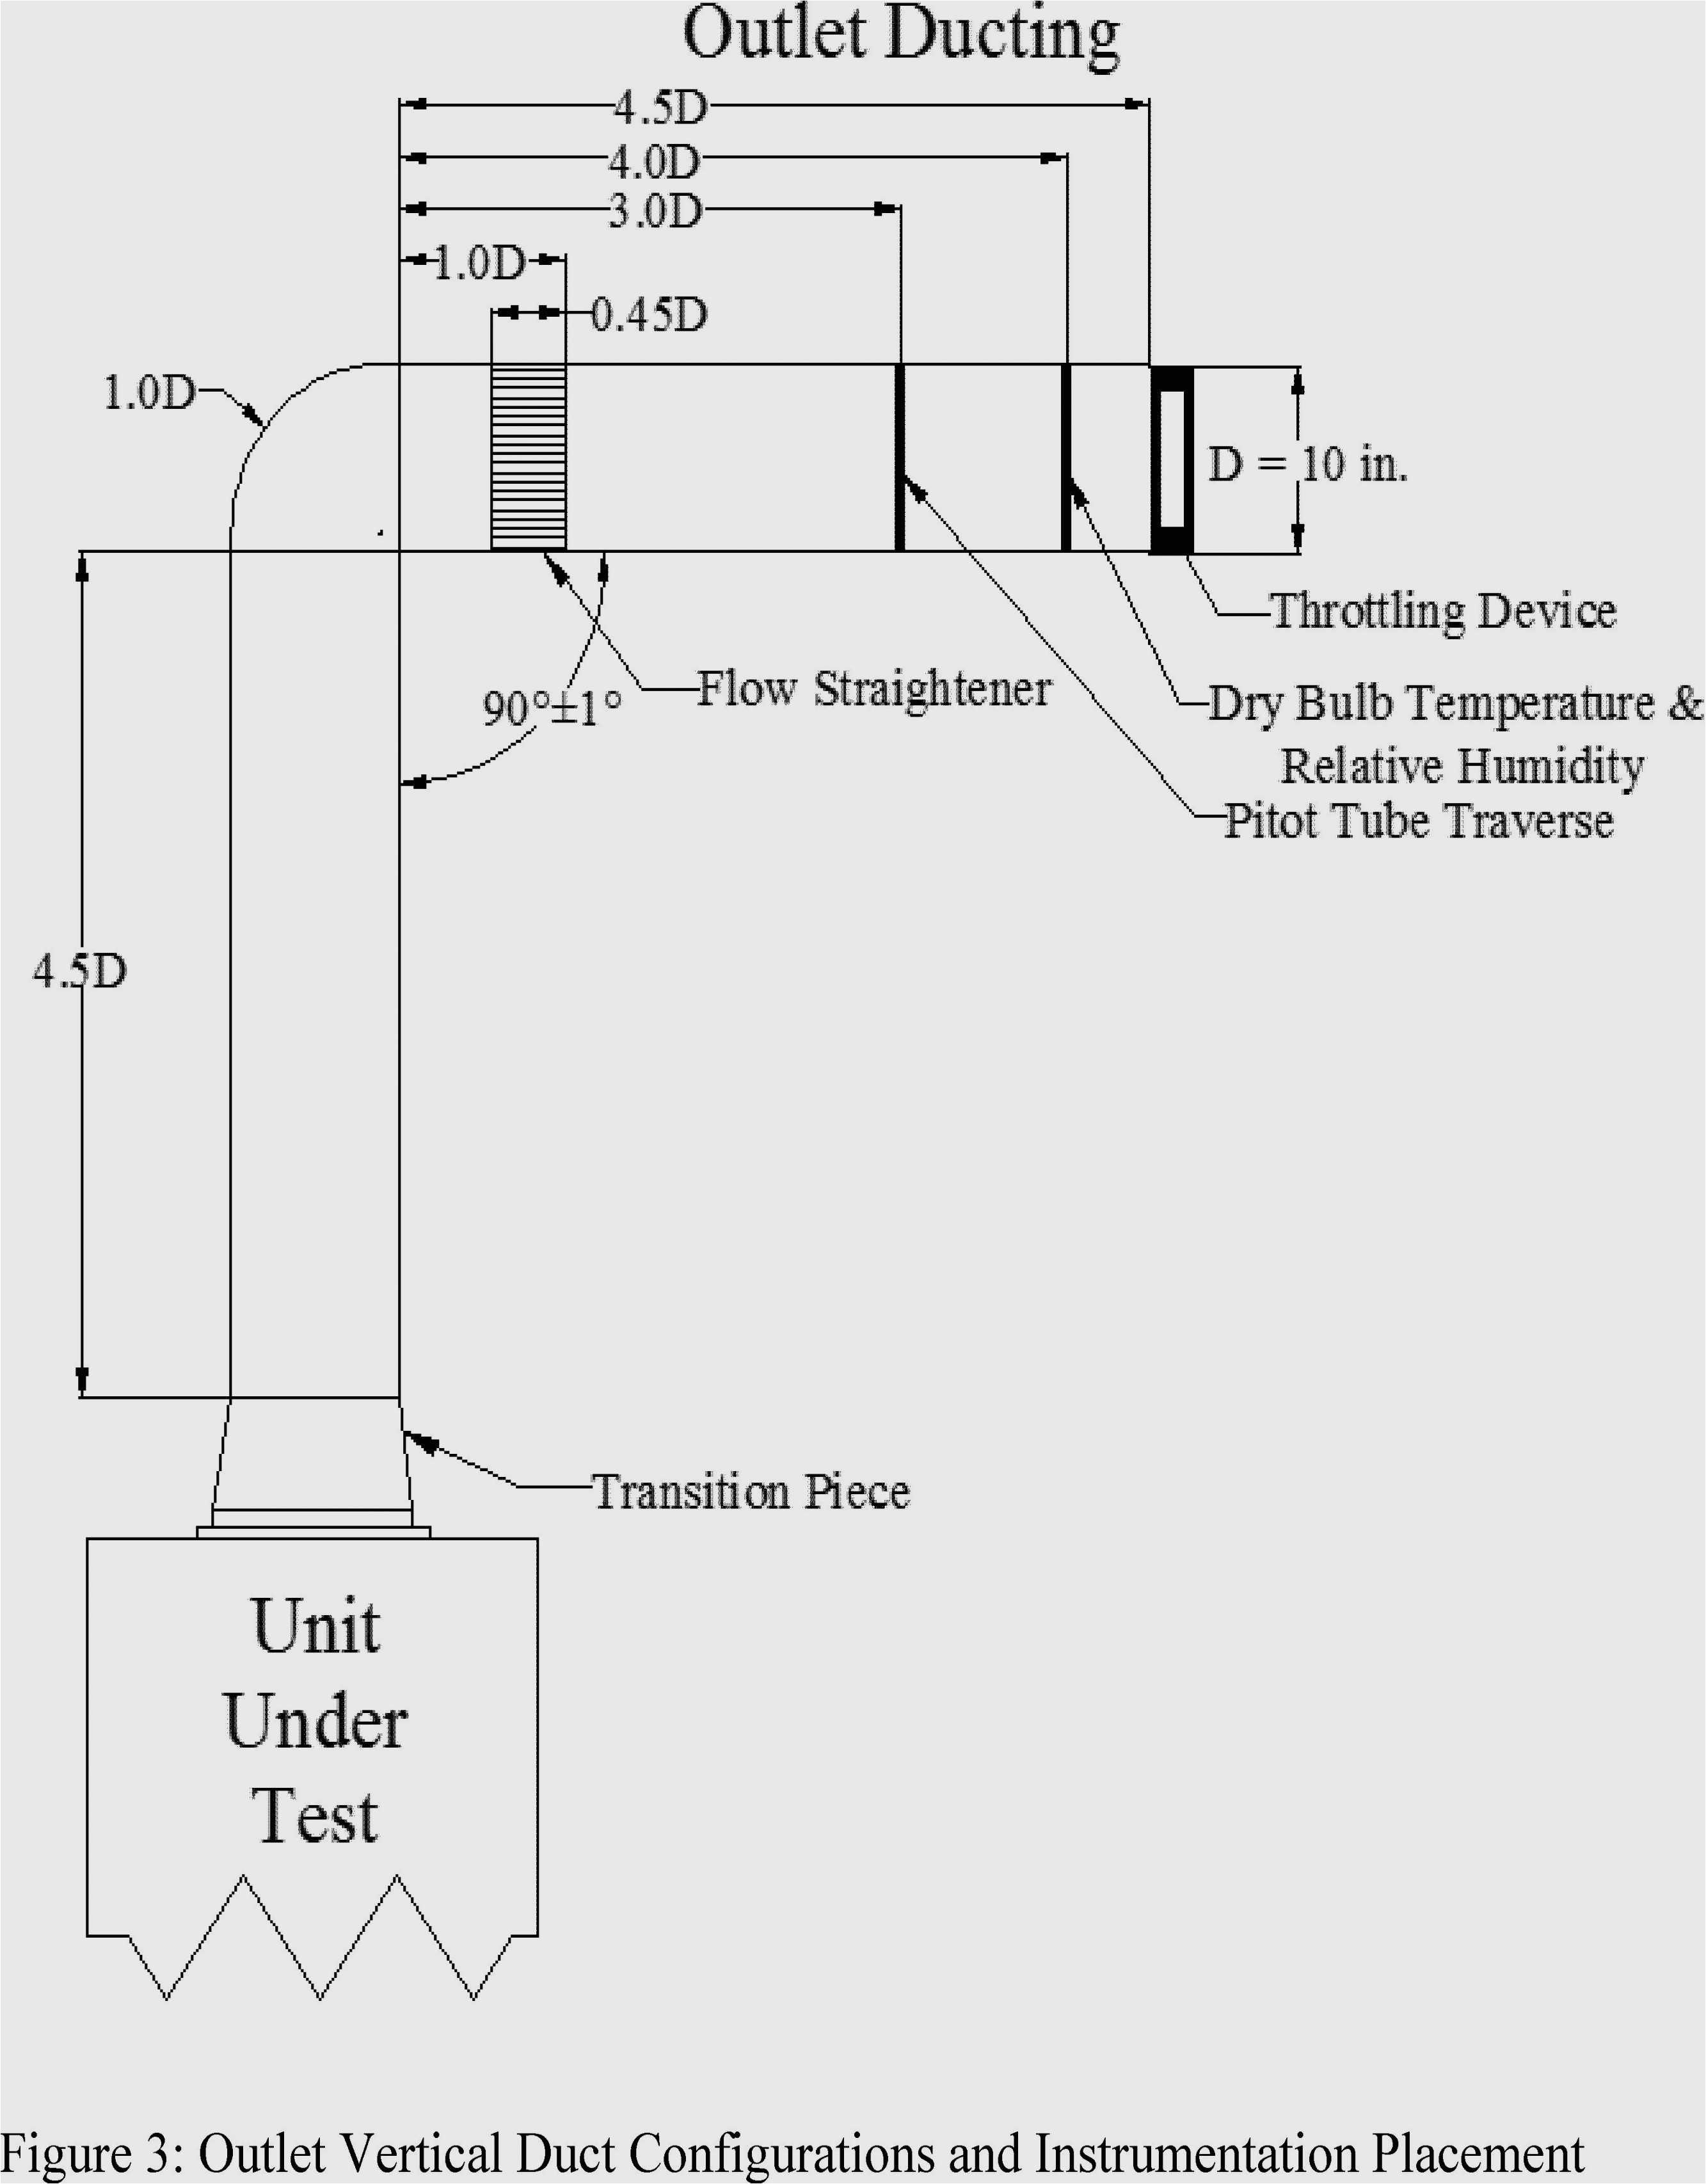 pnp wiring diagram 2004 wiring diagram pnp wiring diagram 2004